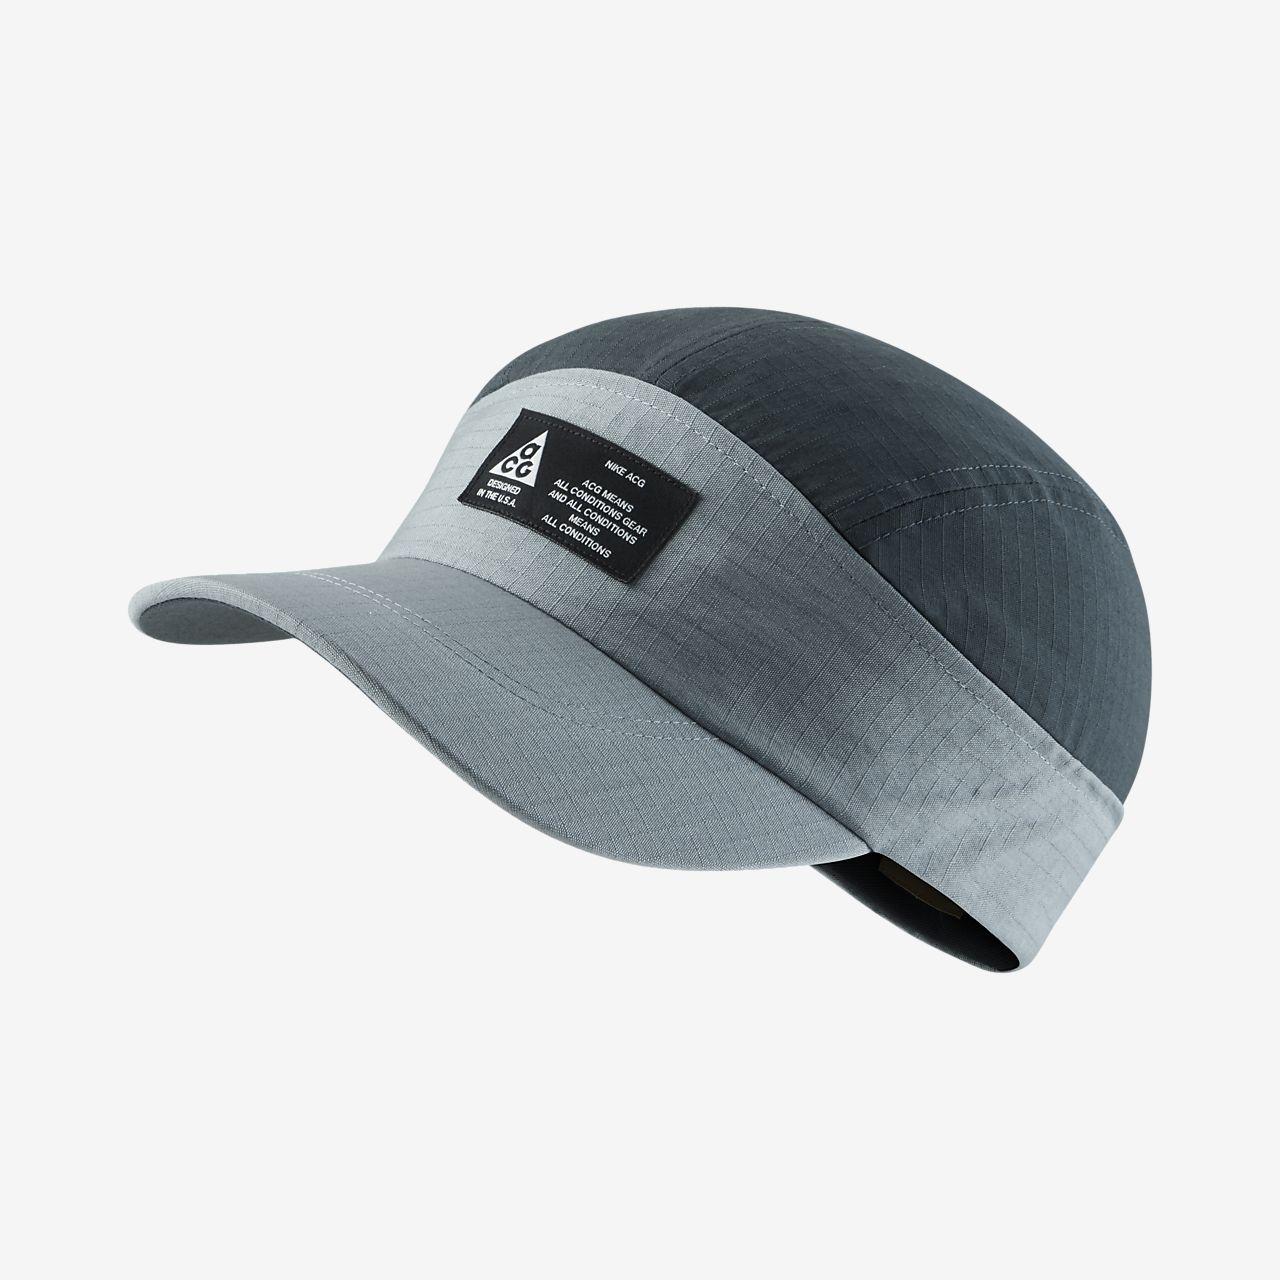 Nike ACG Tailwind caps